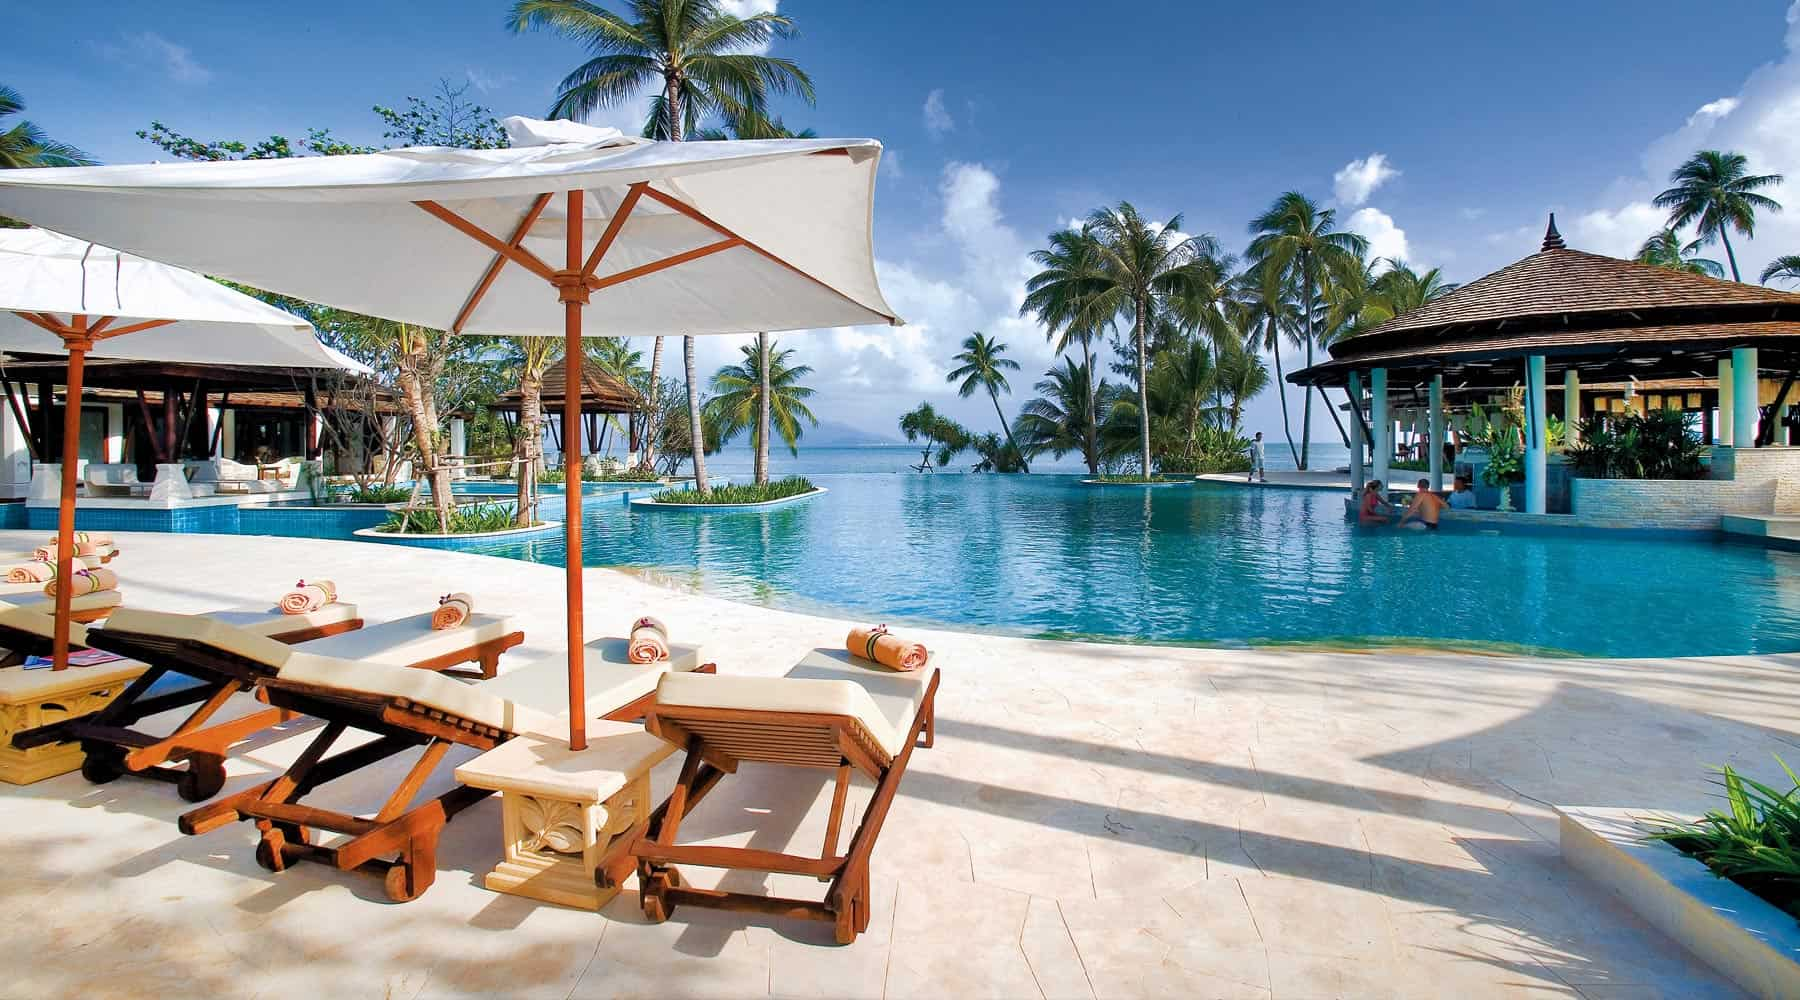 Hotels Vacanze Koh Samui